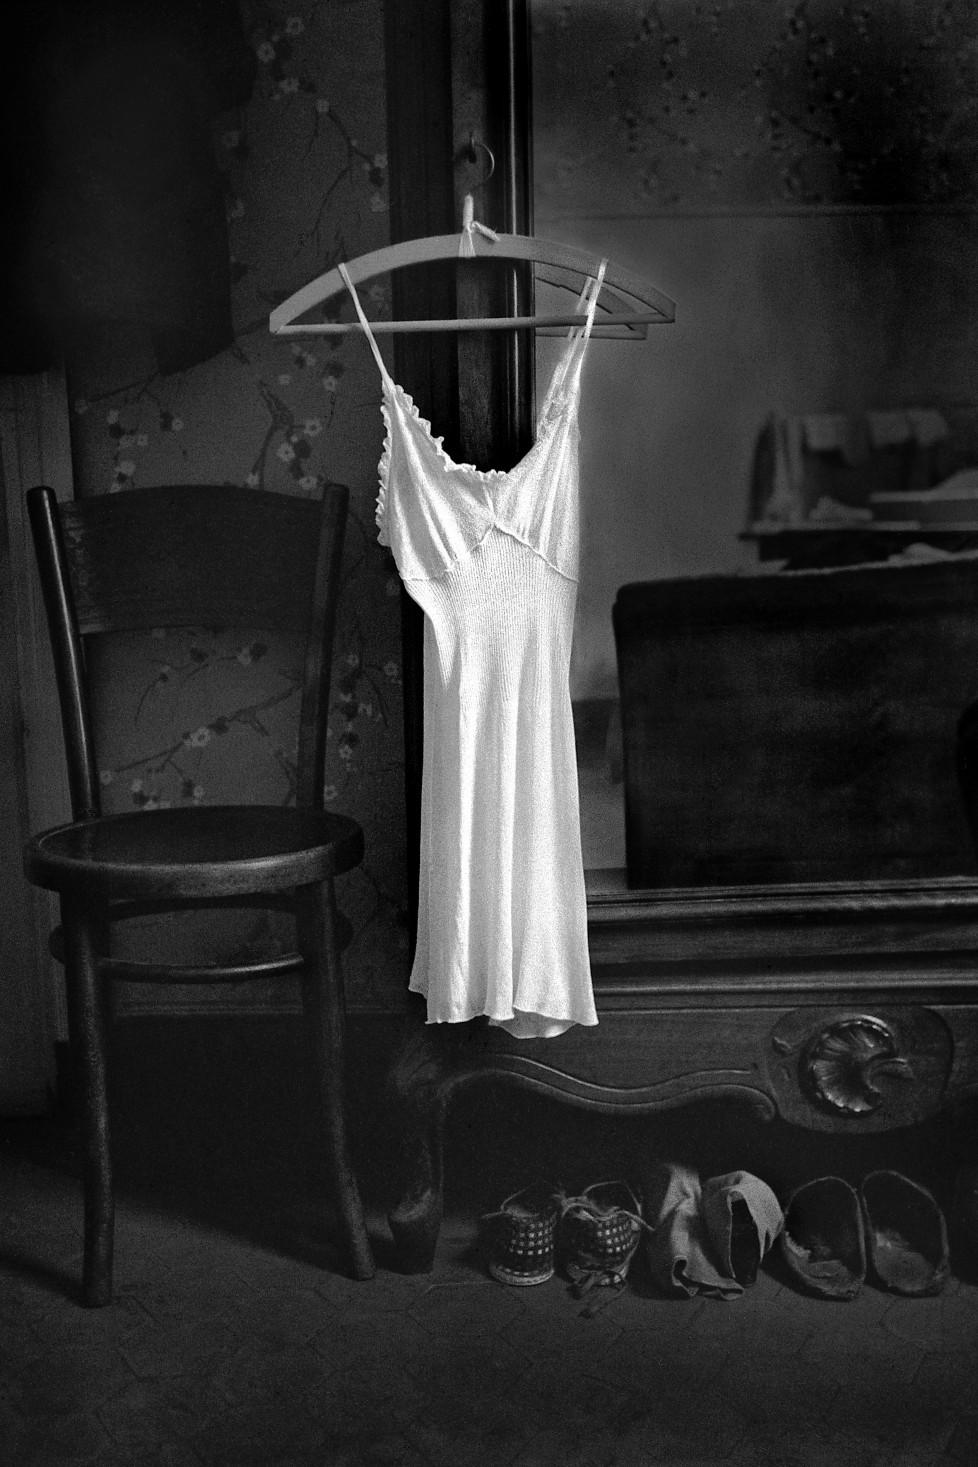 RenéGroebli_AugederLiebe_No517_Paris 1953